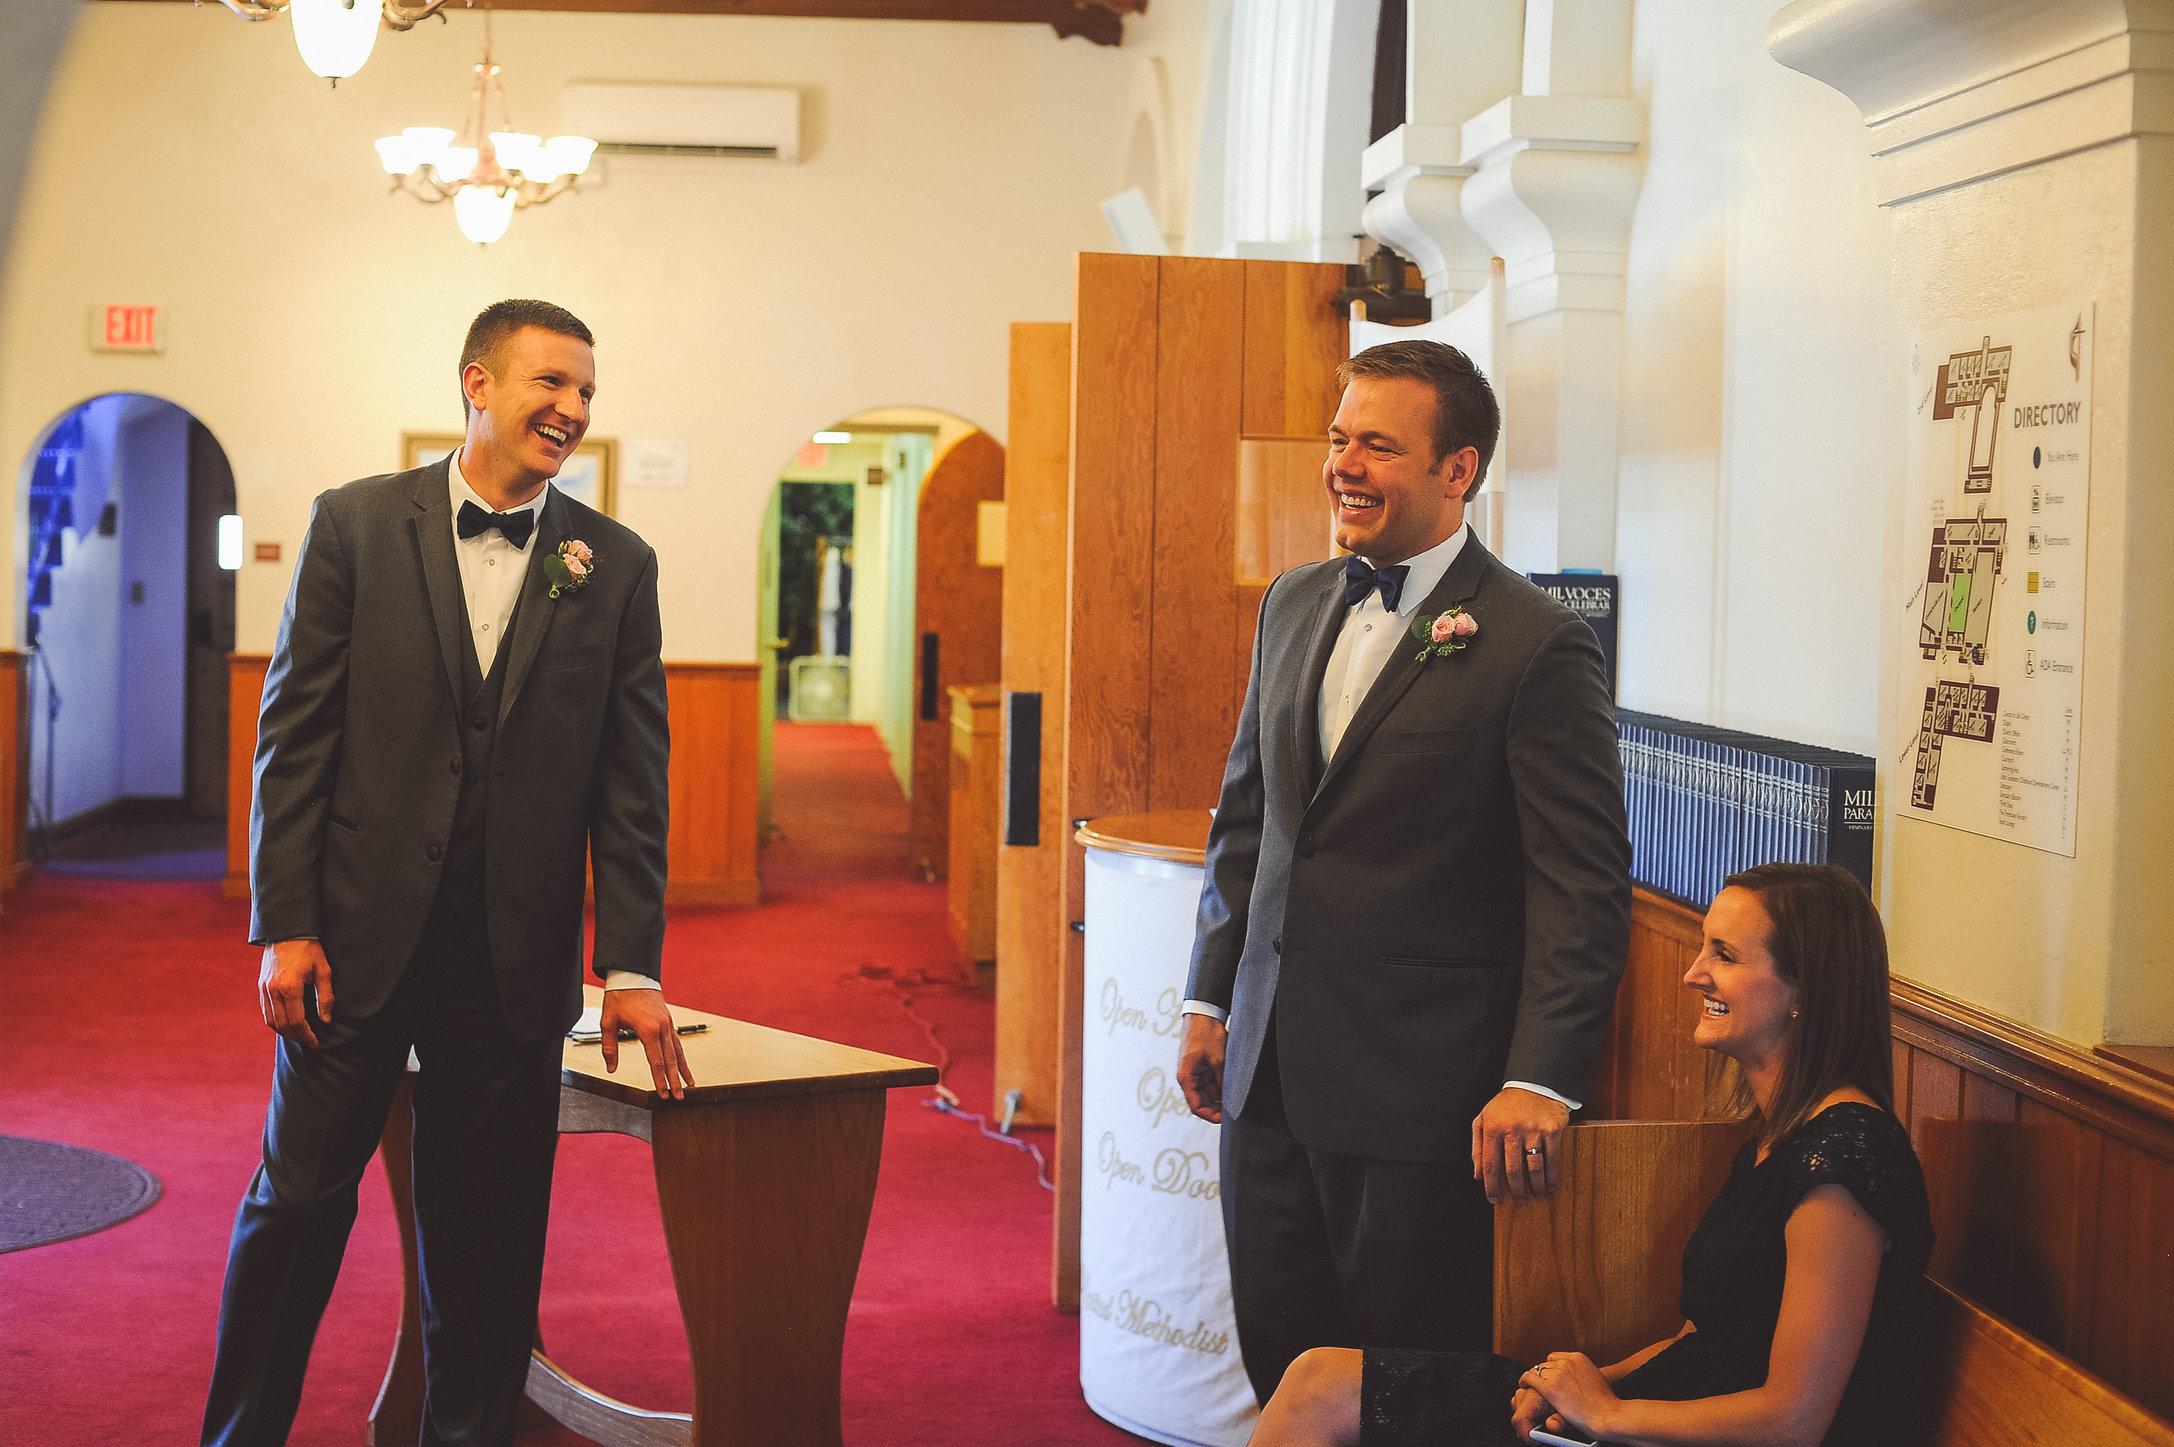 SandC-wedding-142.jpg